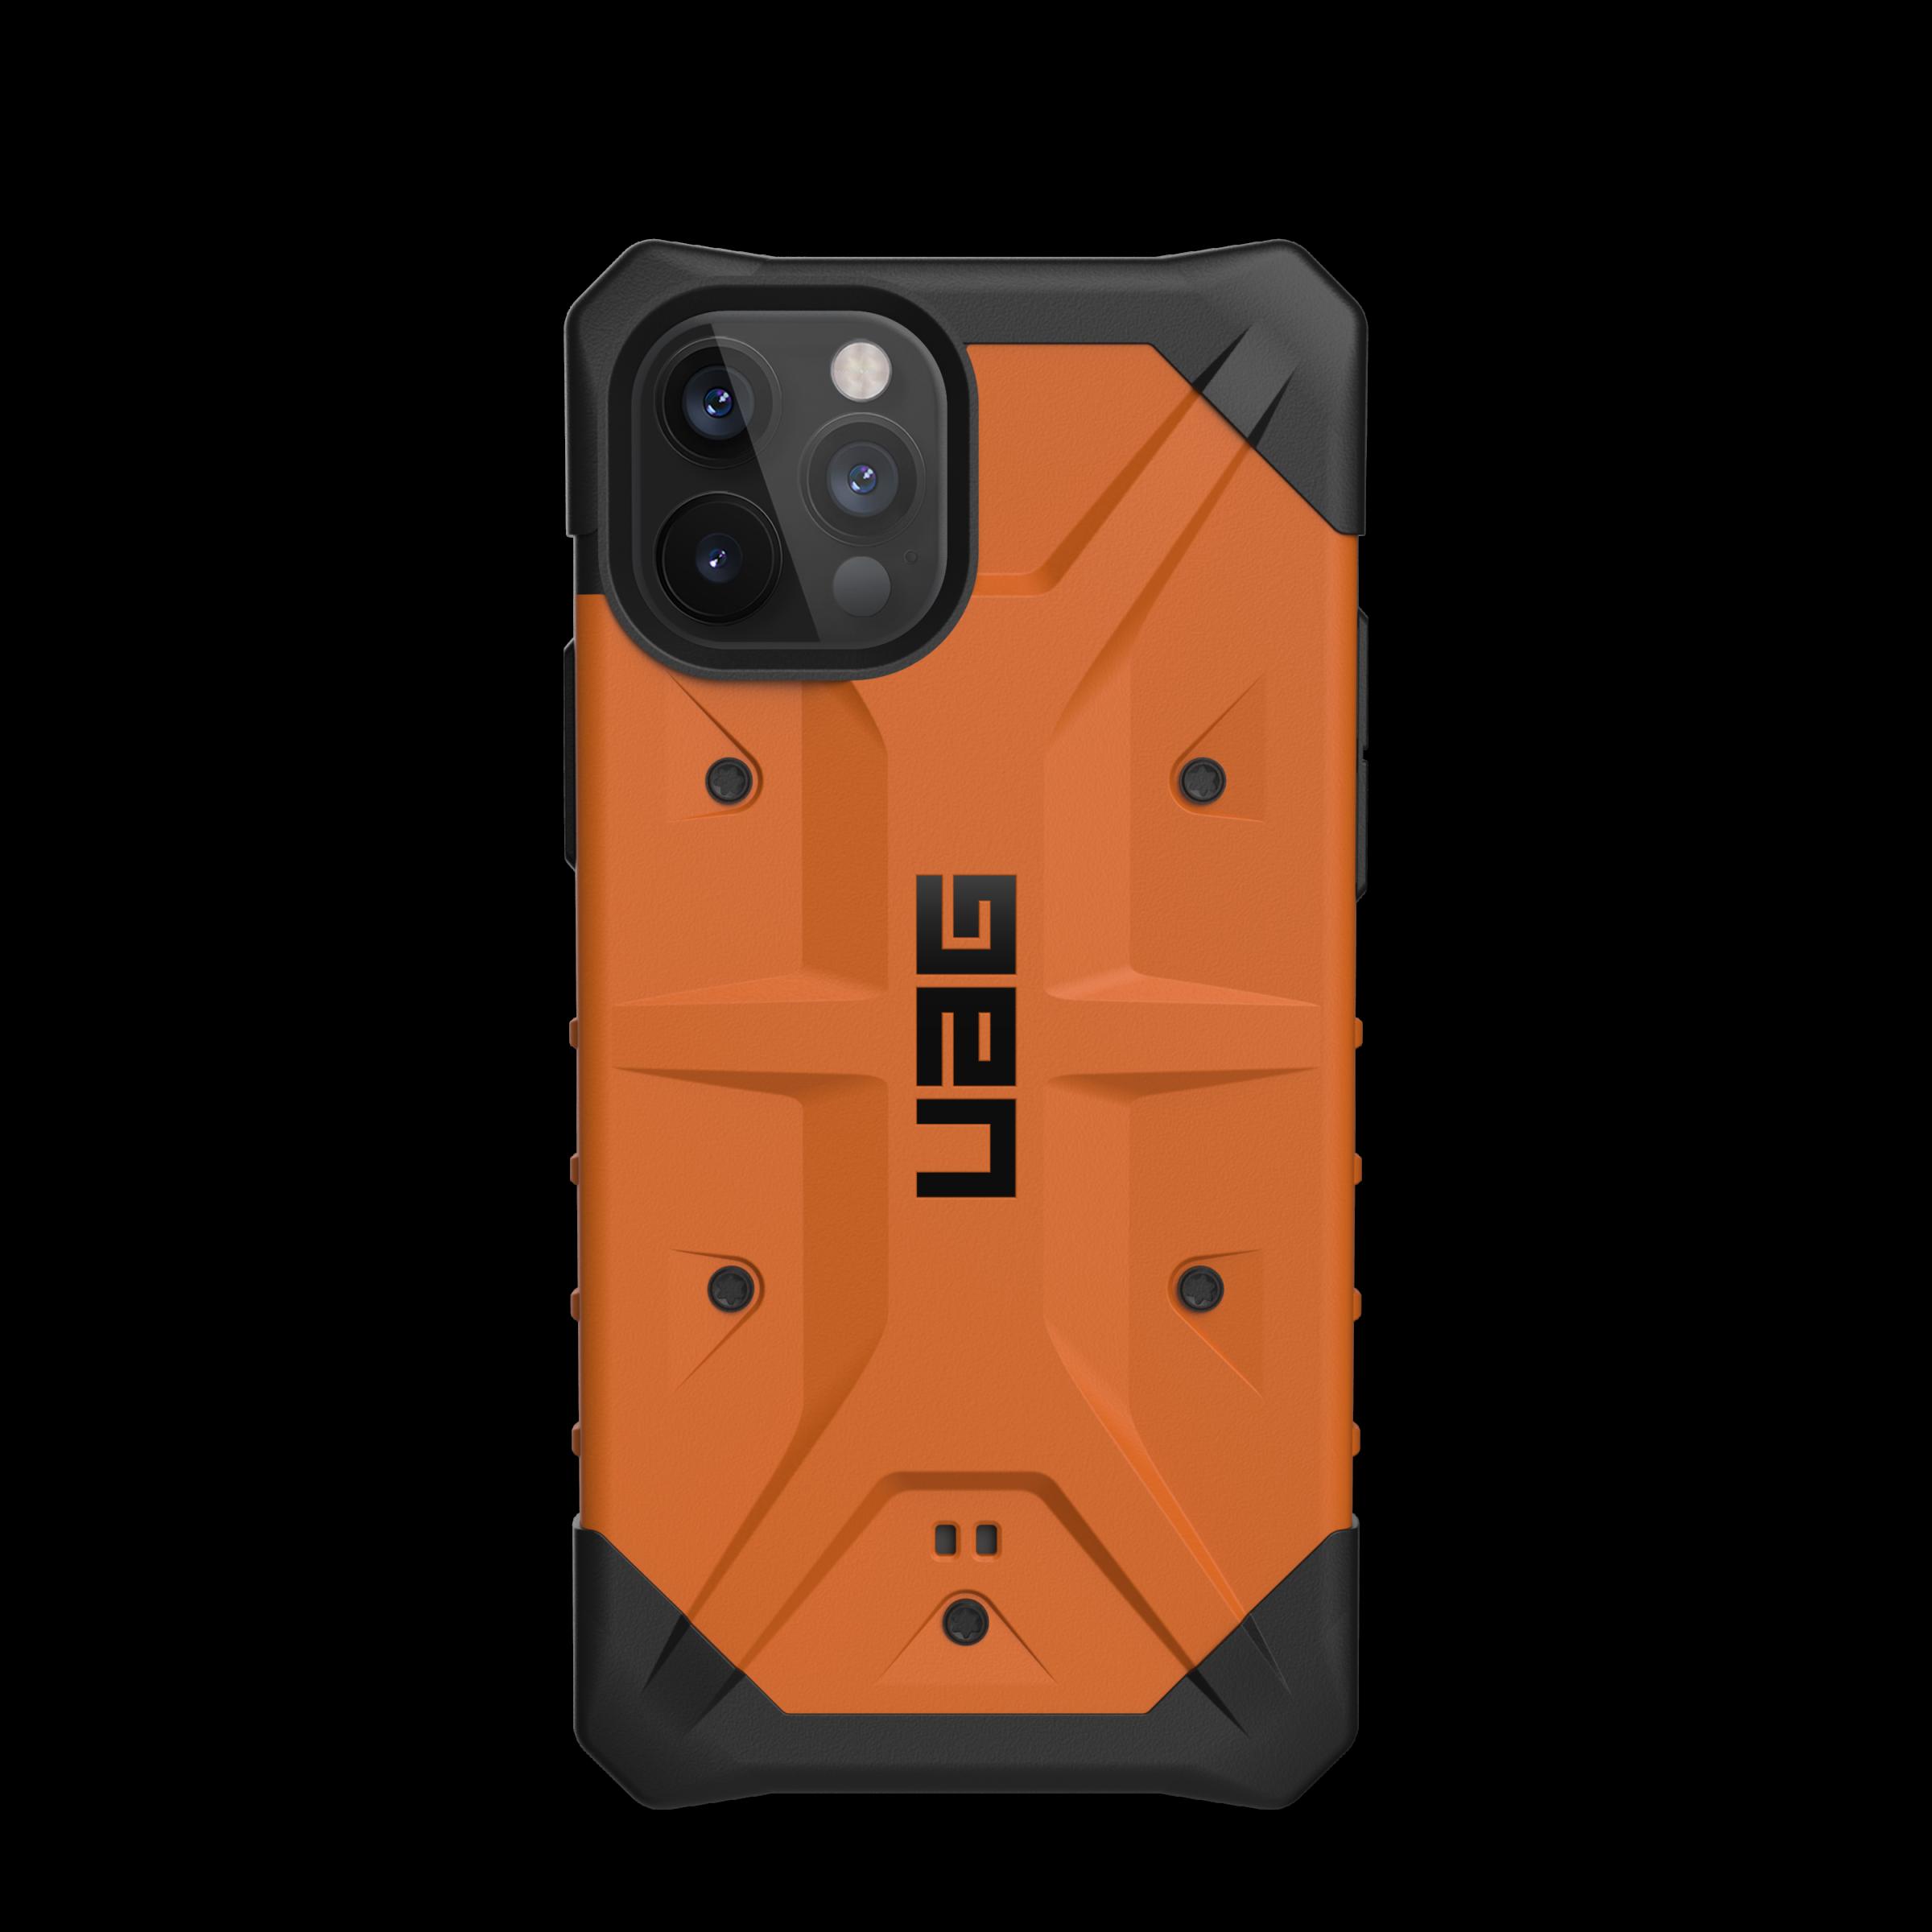 Pathfinder Series Case iPhone 12 Pro Max Orange